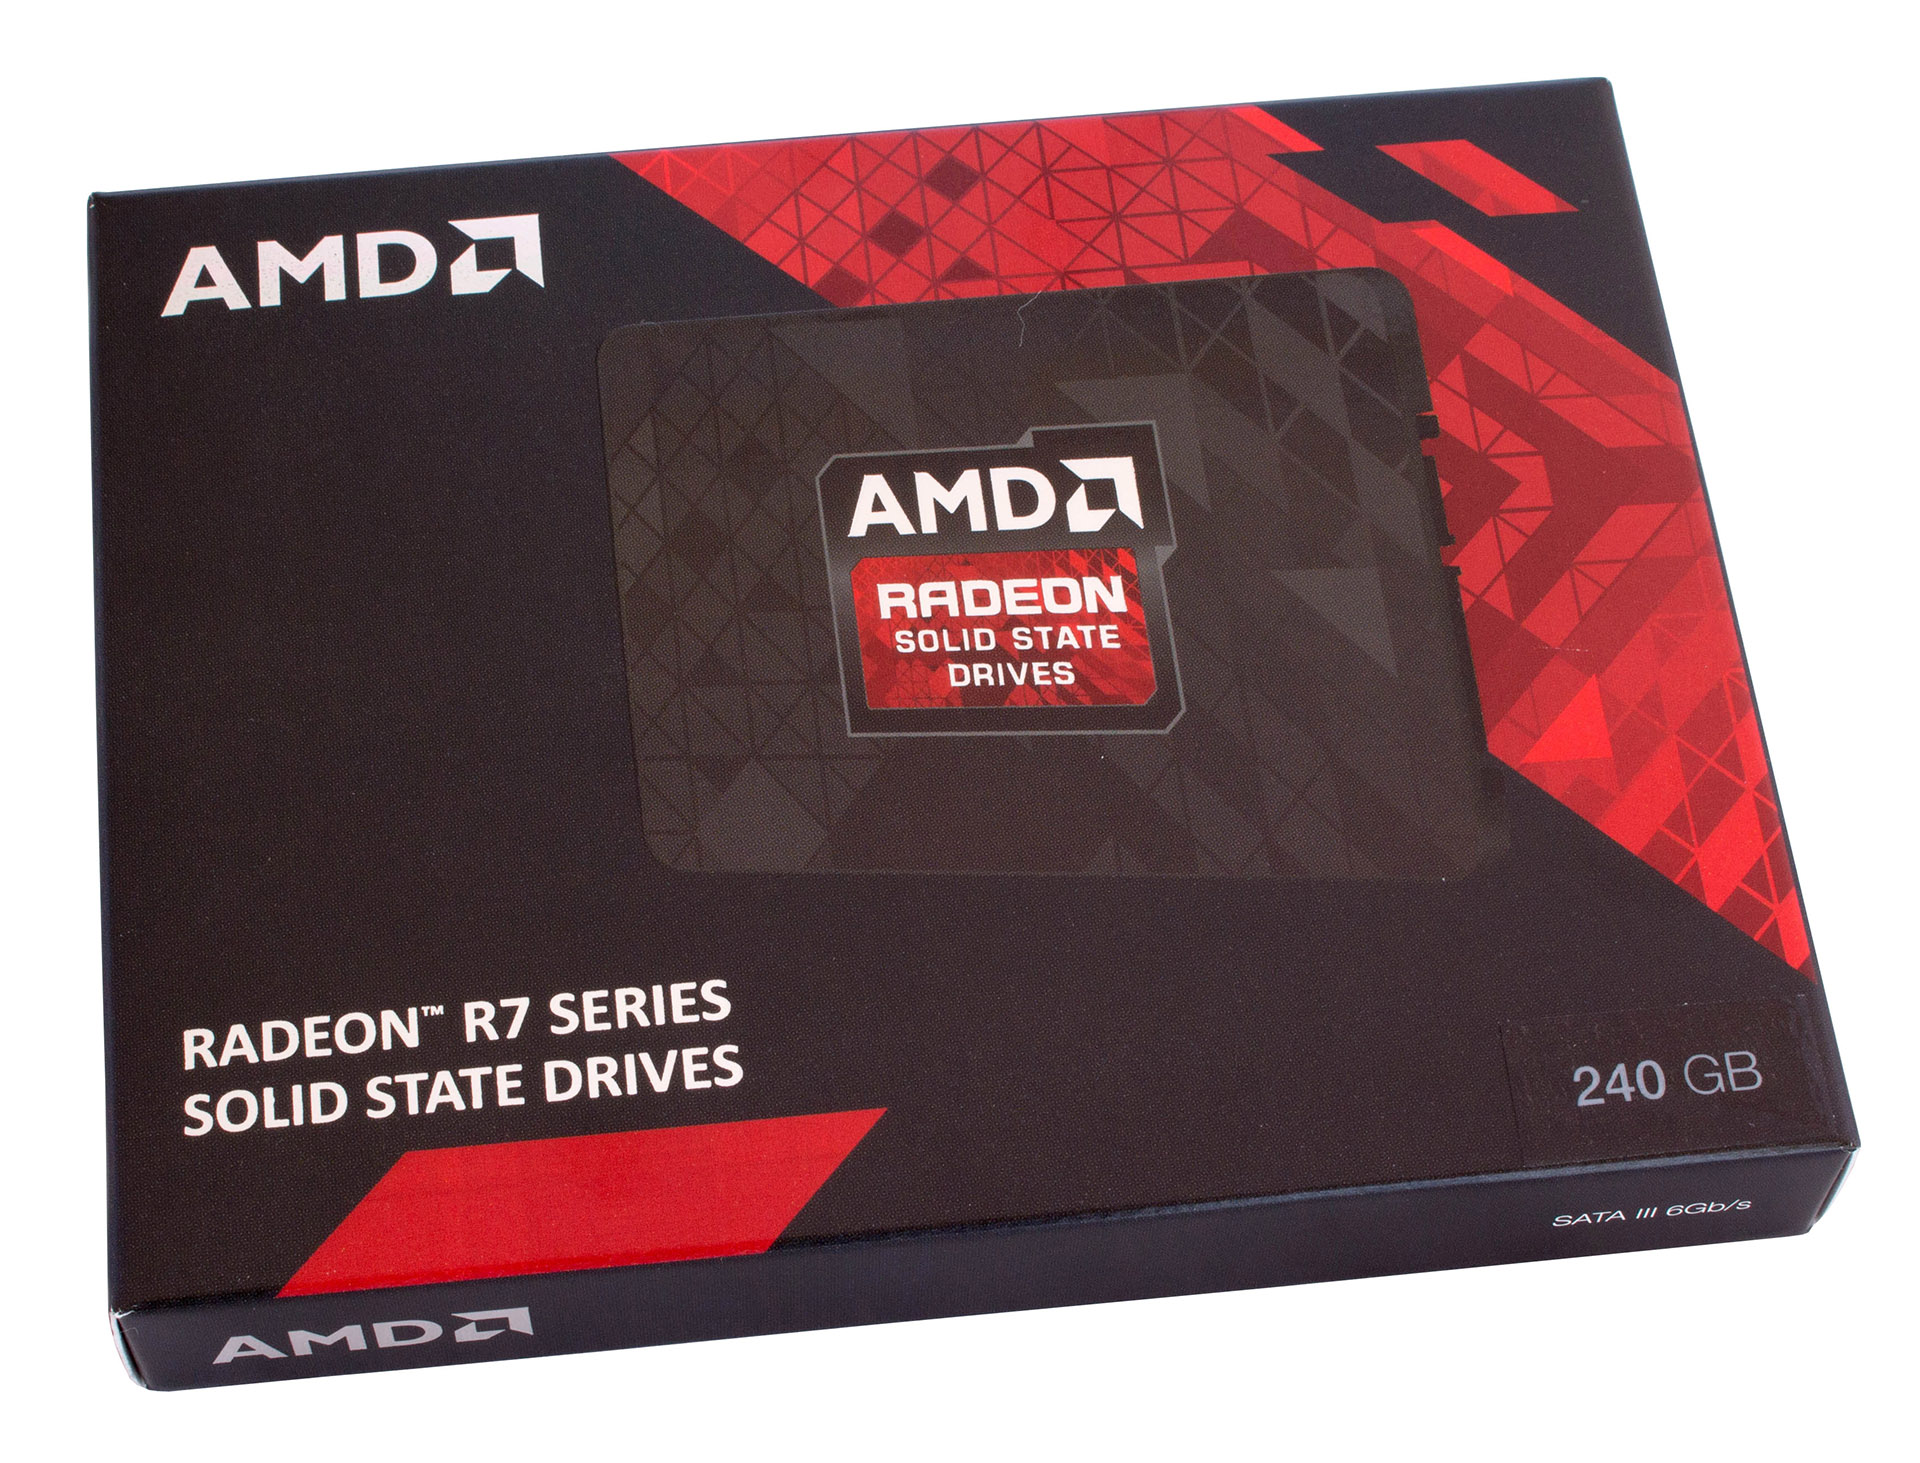 AMD Radeon R7 SSD 240GB